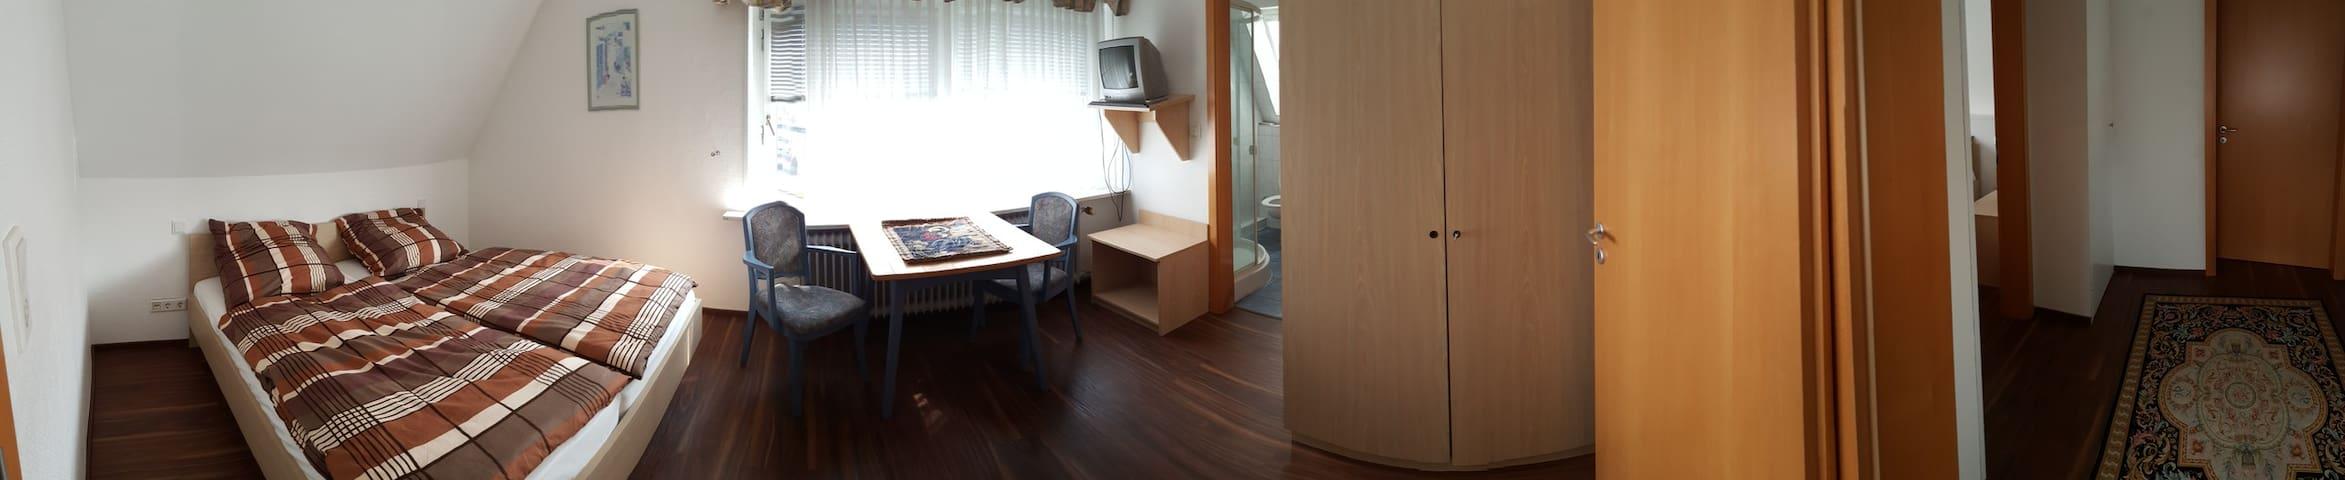 Mobilierte Zimmer in Sande - Sande - 獨棟